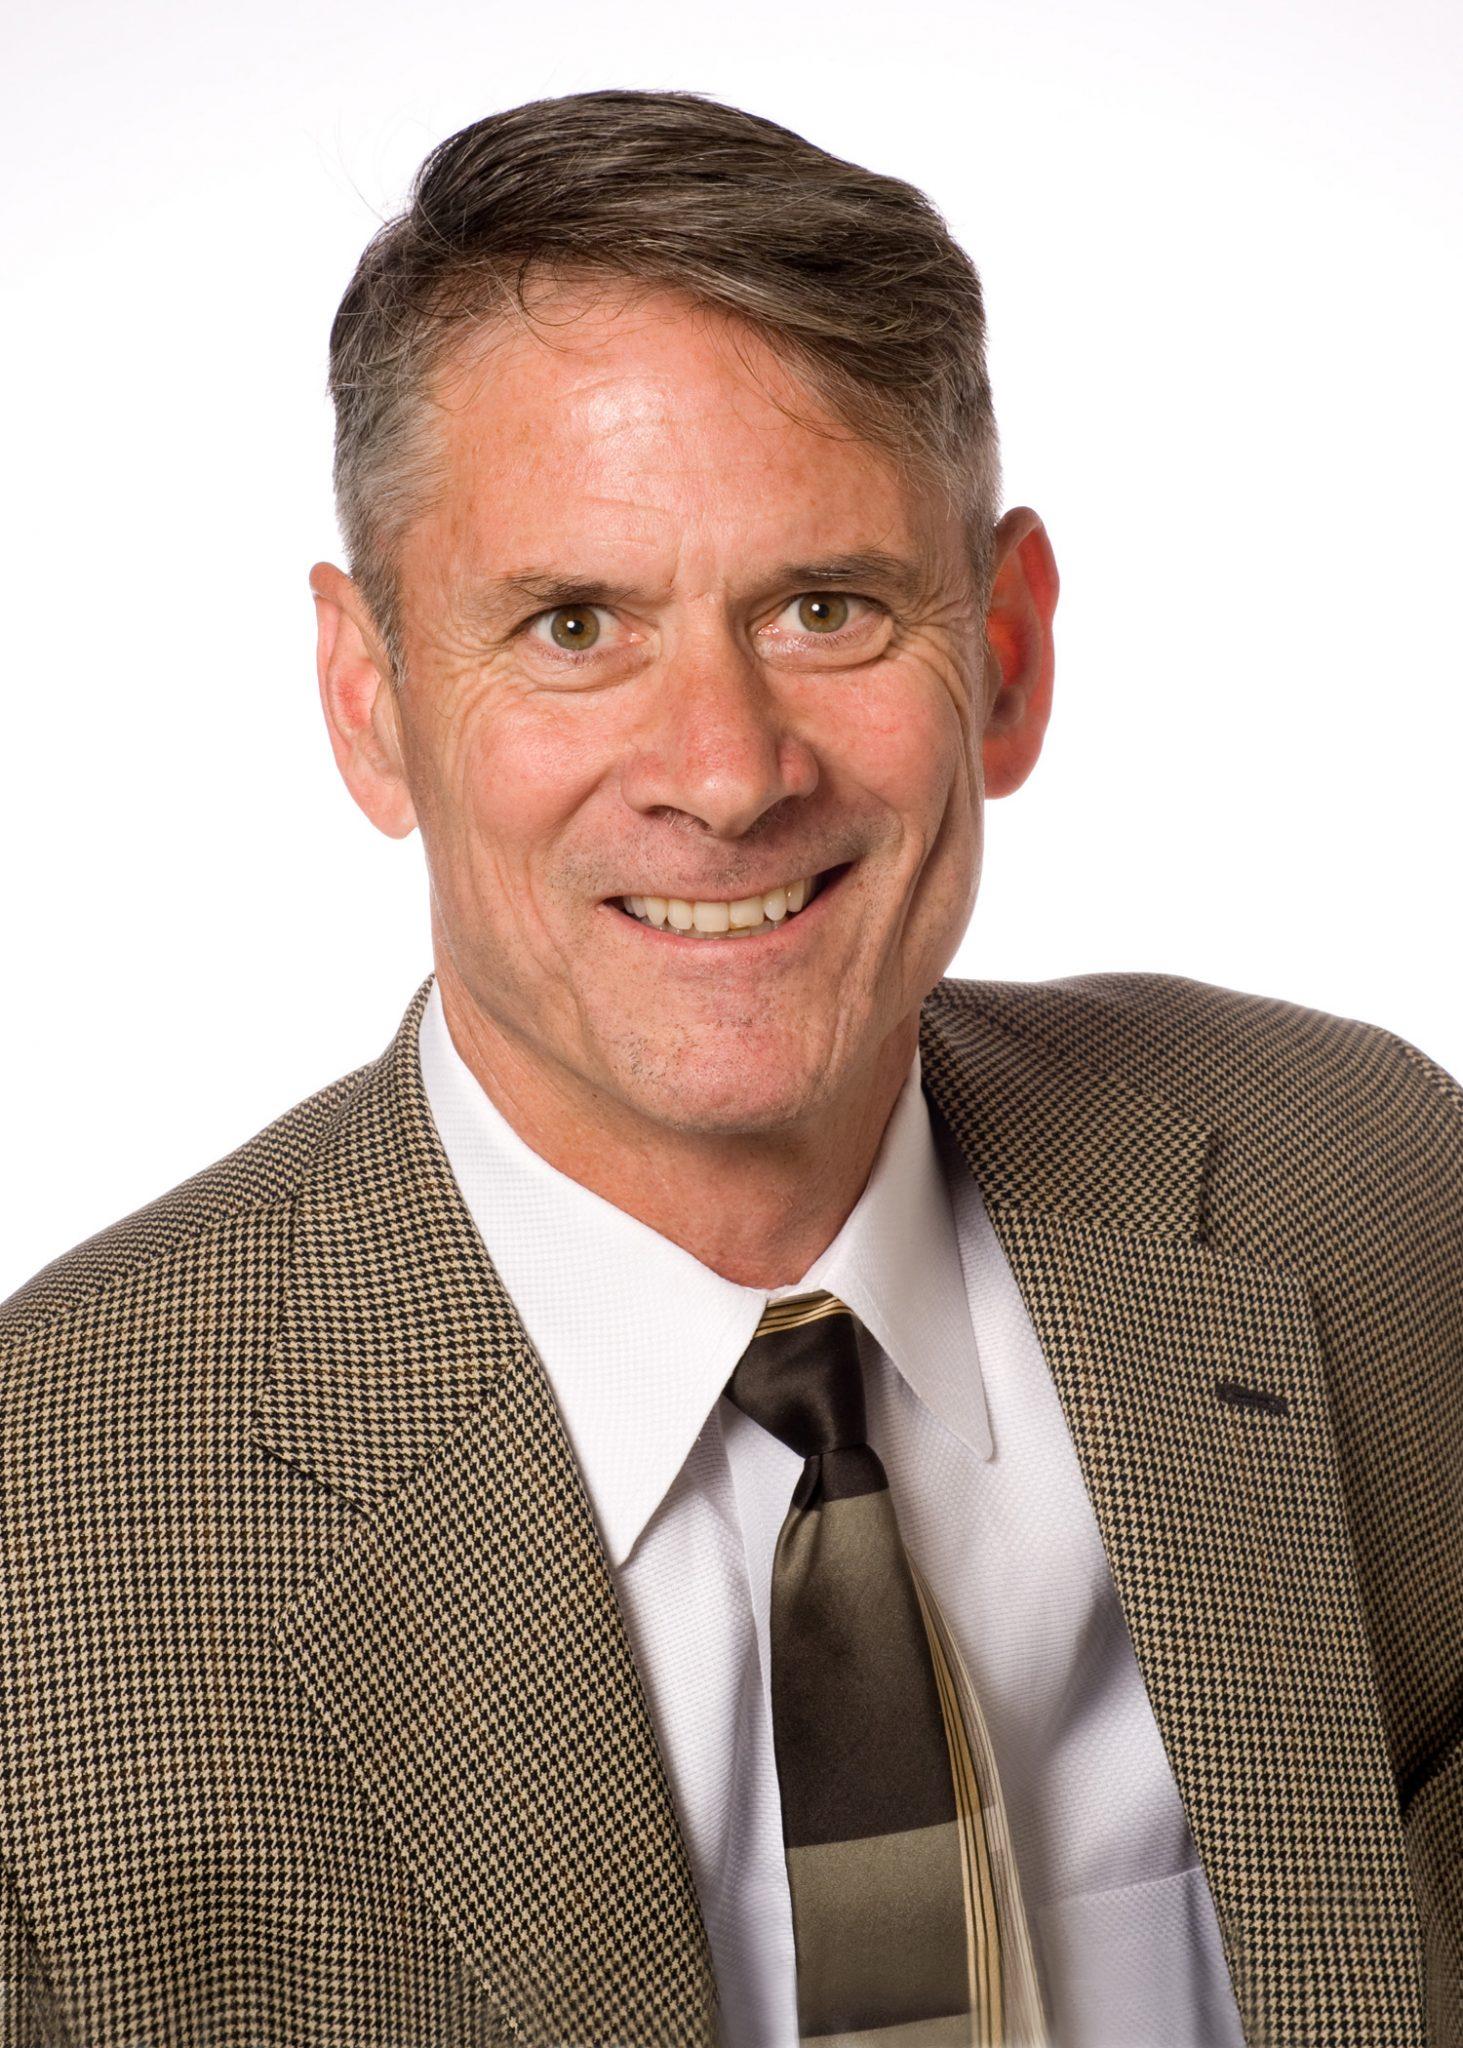 Tom Graff